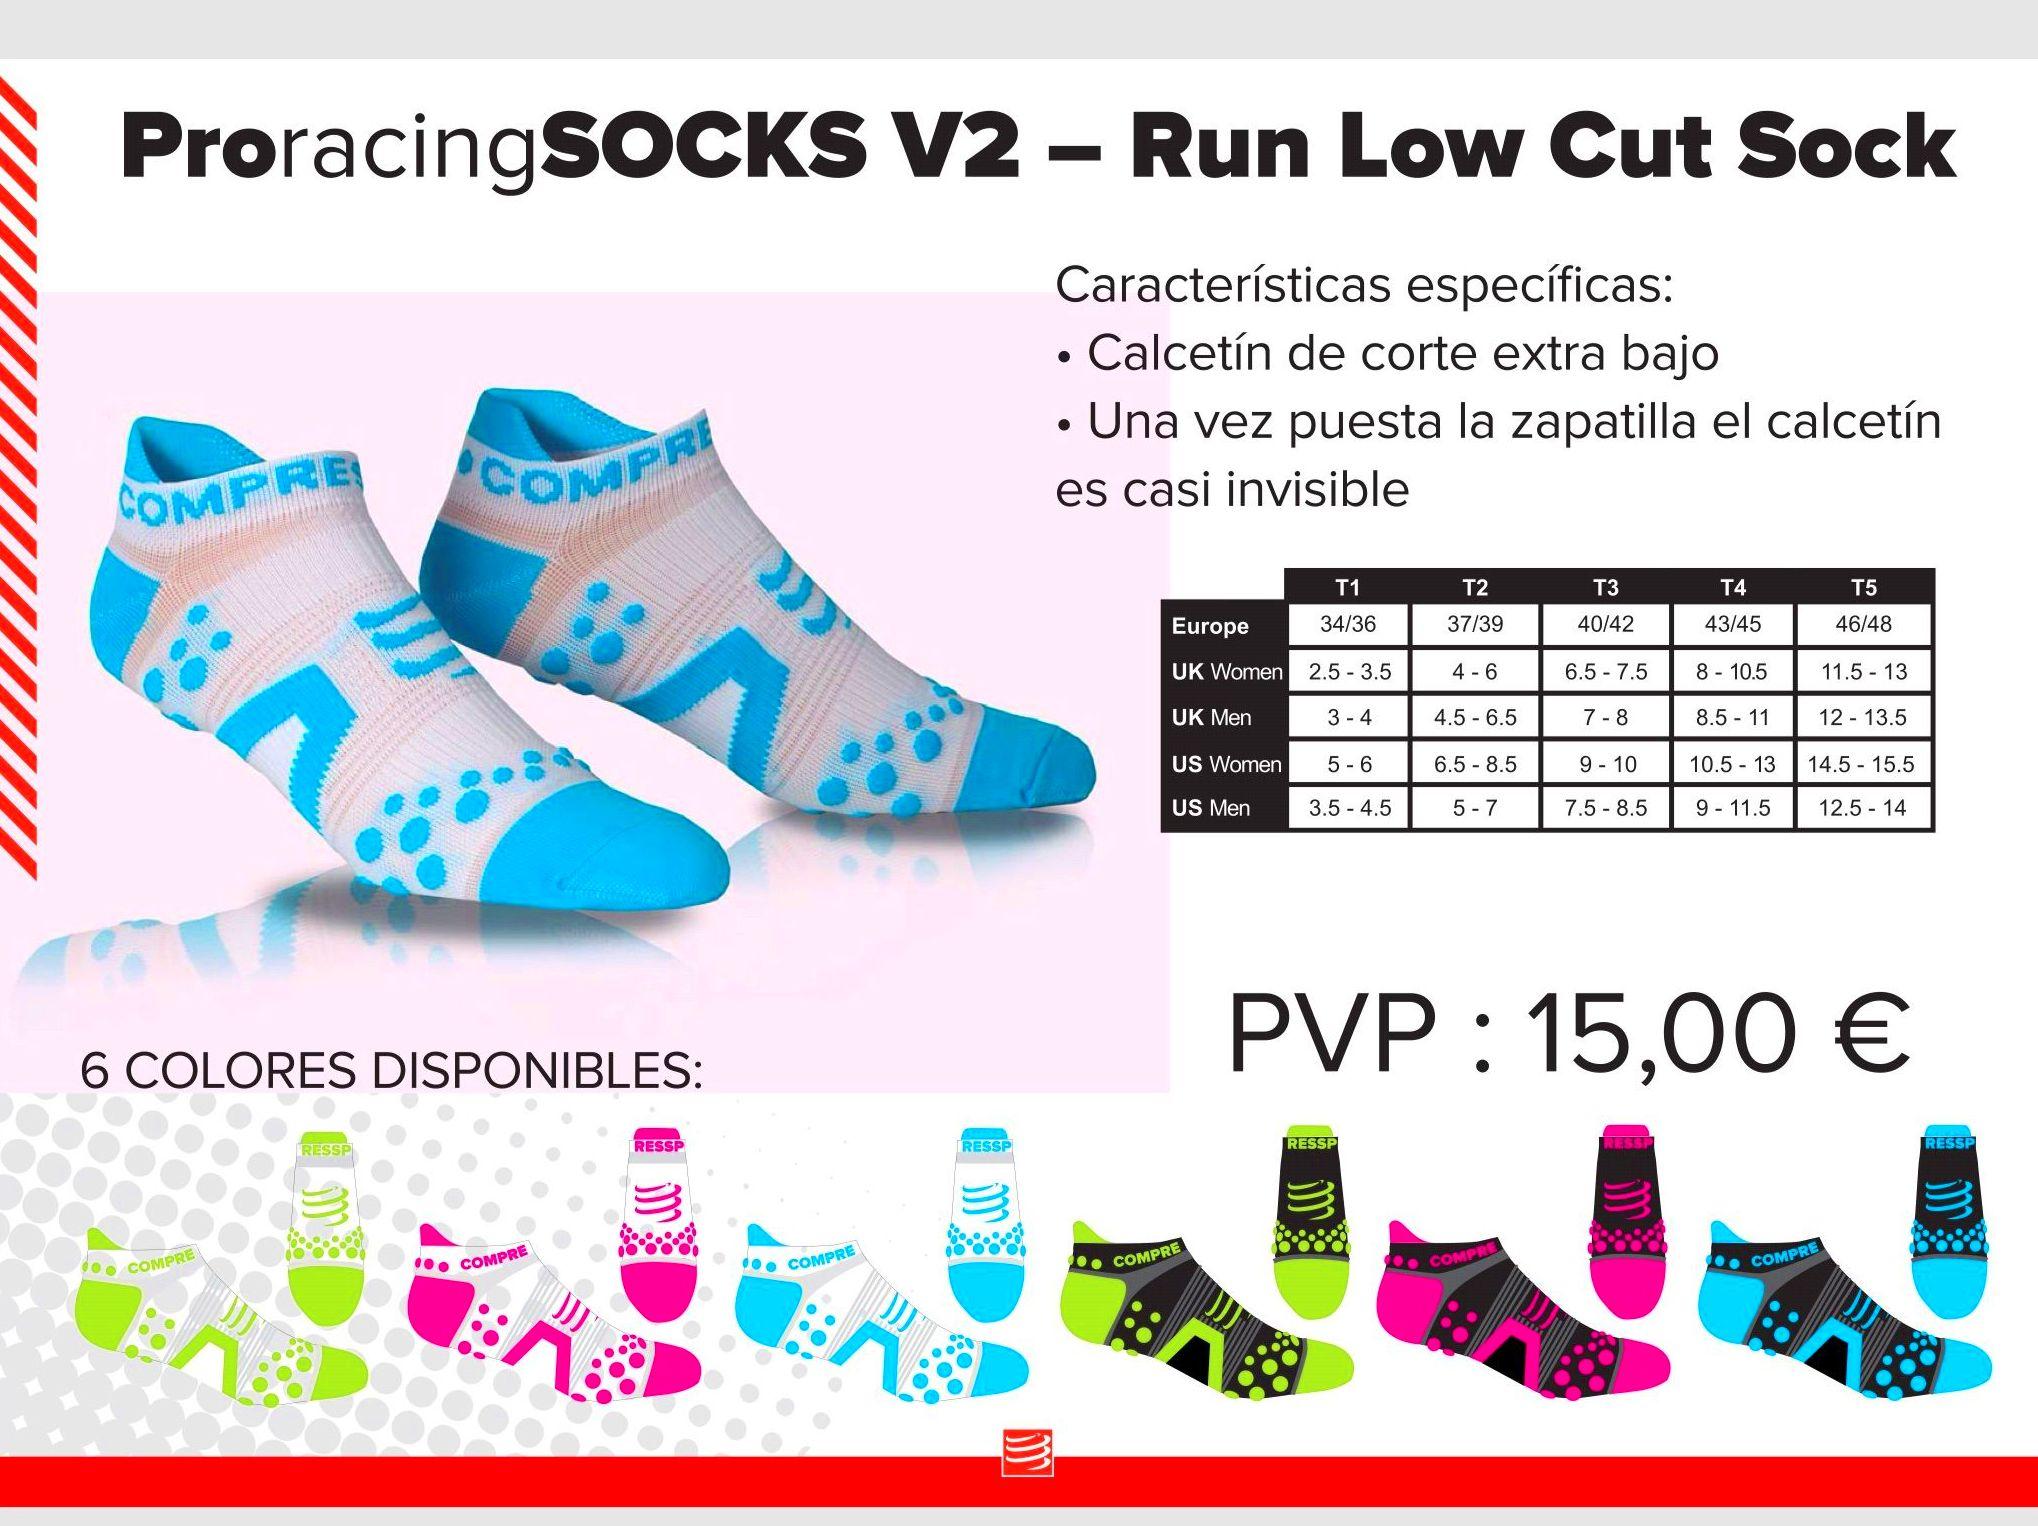 Calcetín tecnico pro racing socks v2 -run low Cut sock: TIENDA ONLINE de Ortopedia La Fama